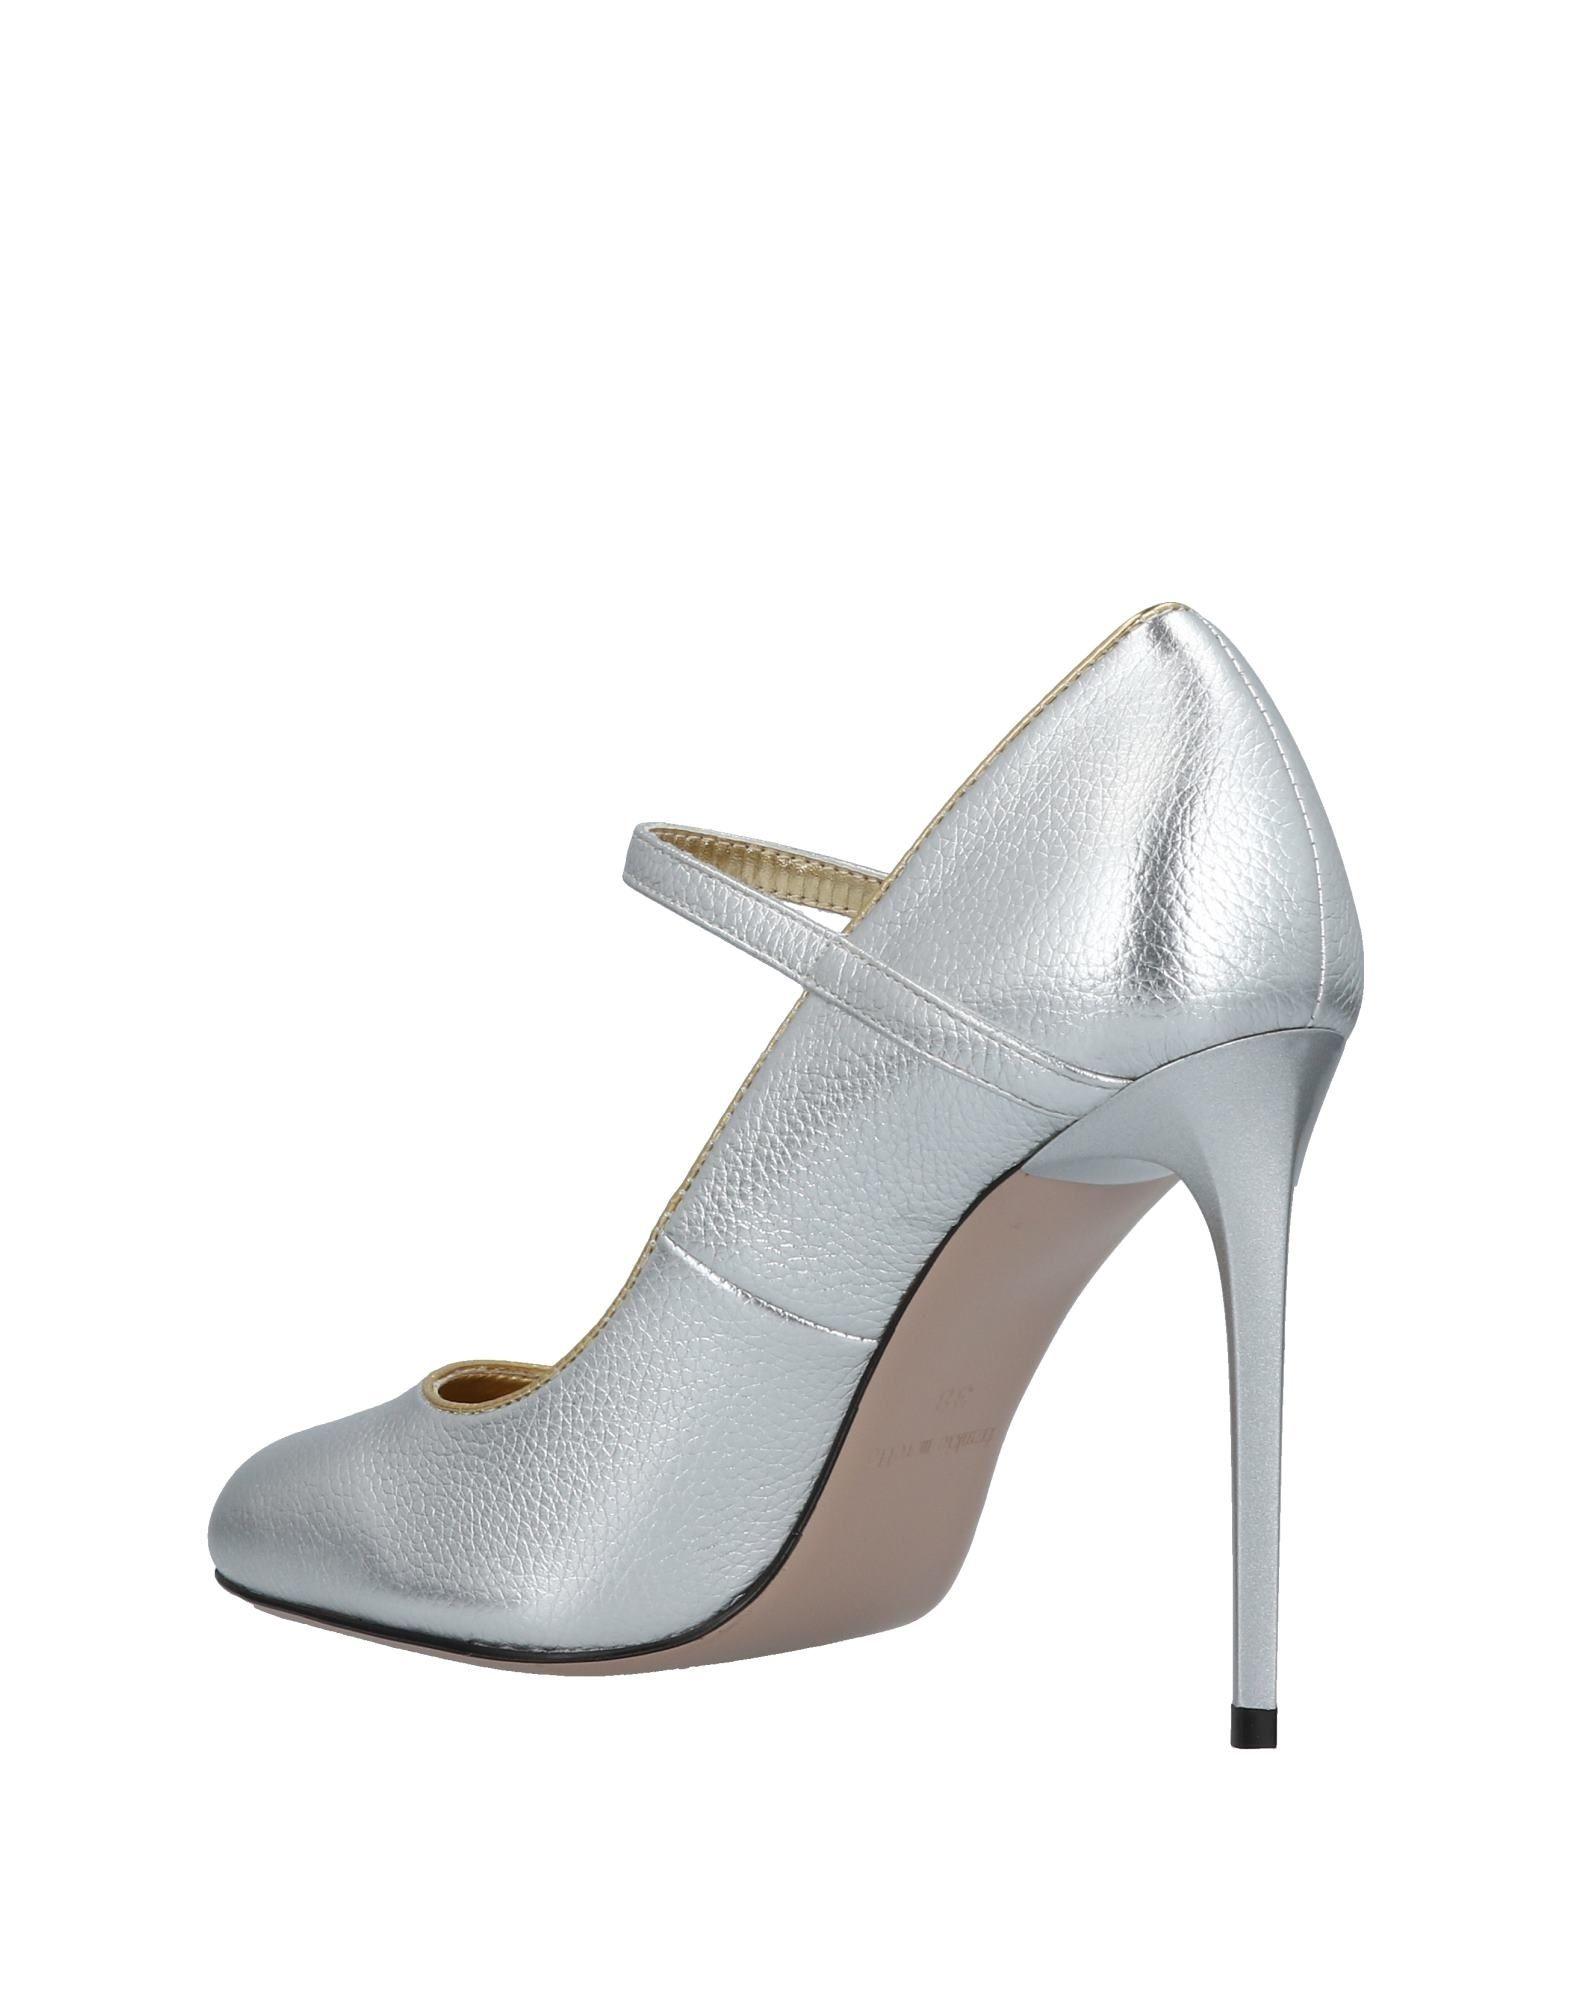 Gut um billige Schuhe Schuhe Schuhe zu tragenFrankie Morello Pumps Damen  11447620GA d3cc64